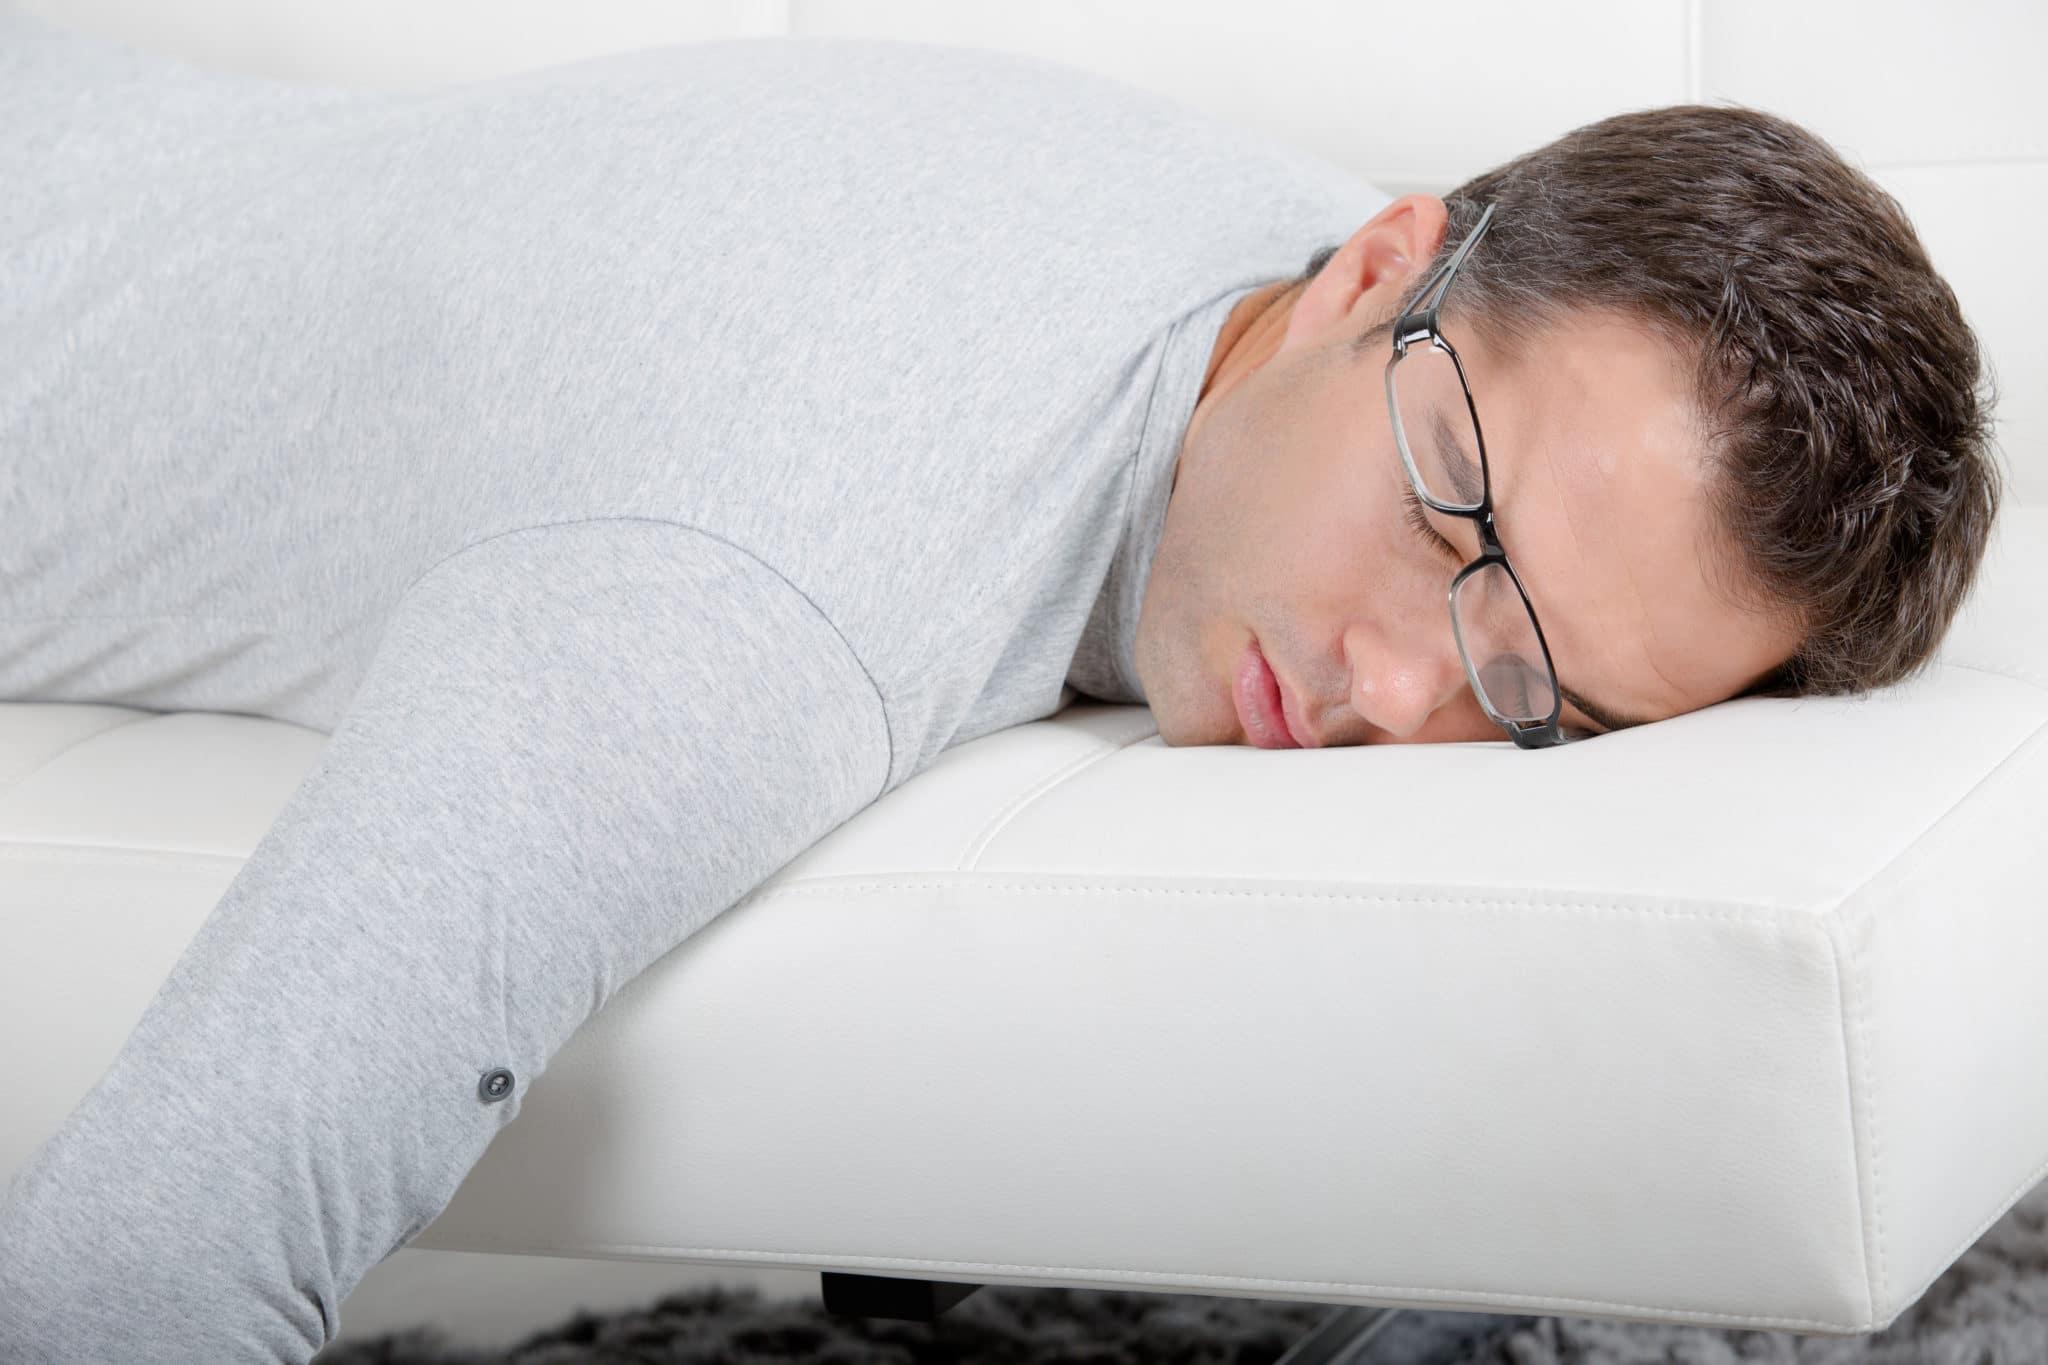 Combatting Fatigue the Natural Way